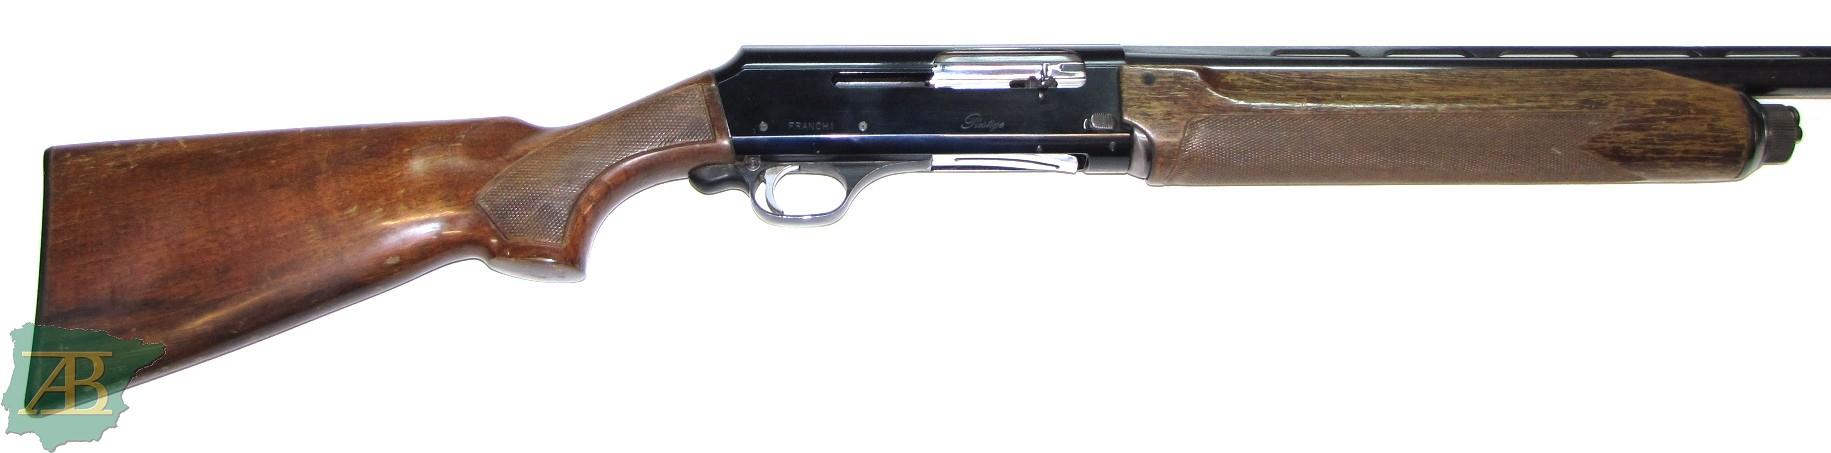 Escopeta semiautomática de caza FRANCHI PRESTIGE Ref 6025-armeriaiberica-2